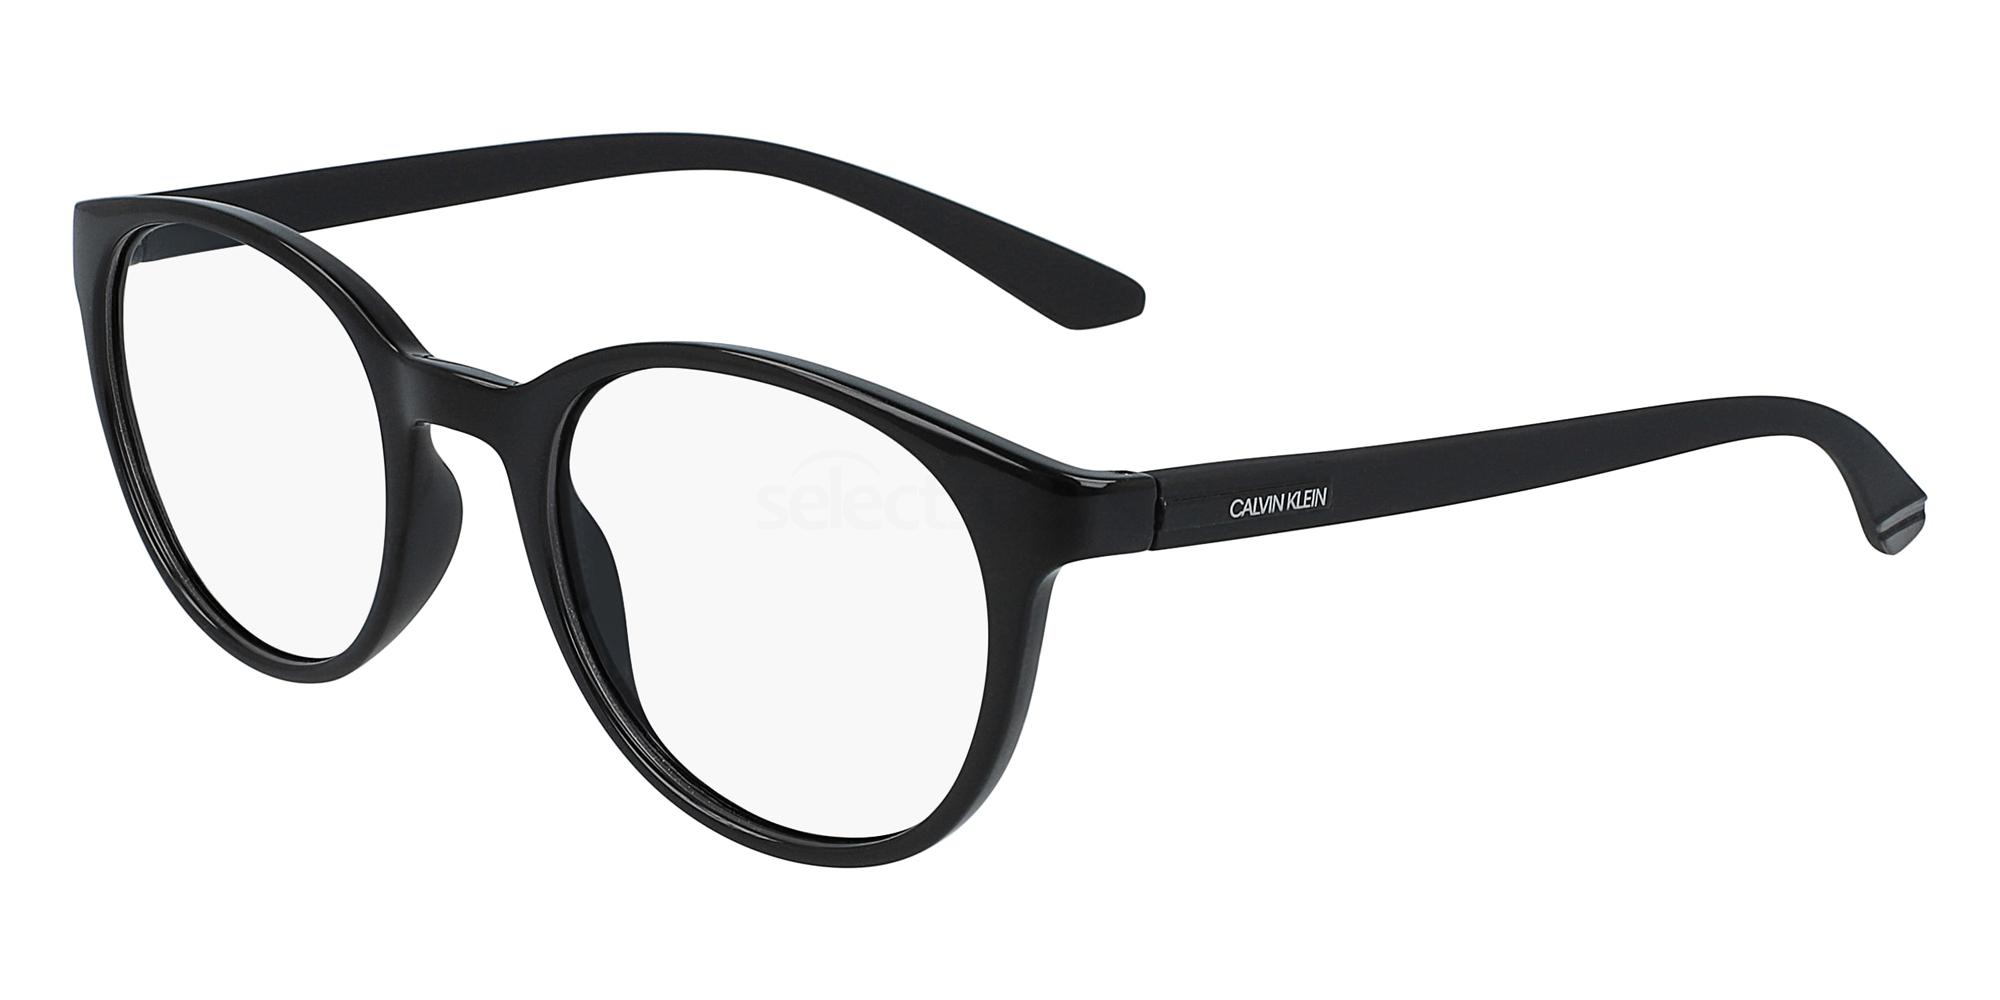 001 CK19570 Glasses, Calvin Klein